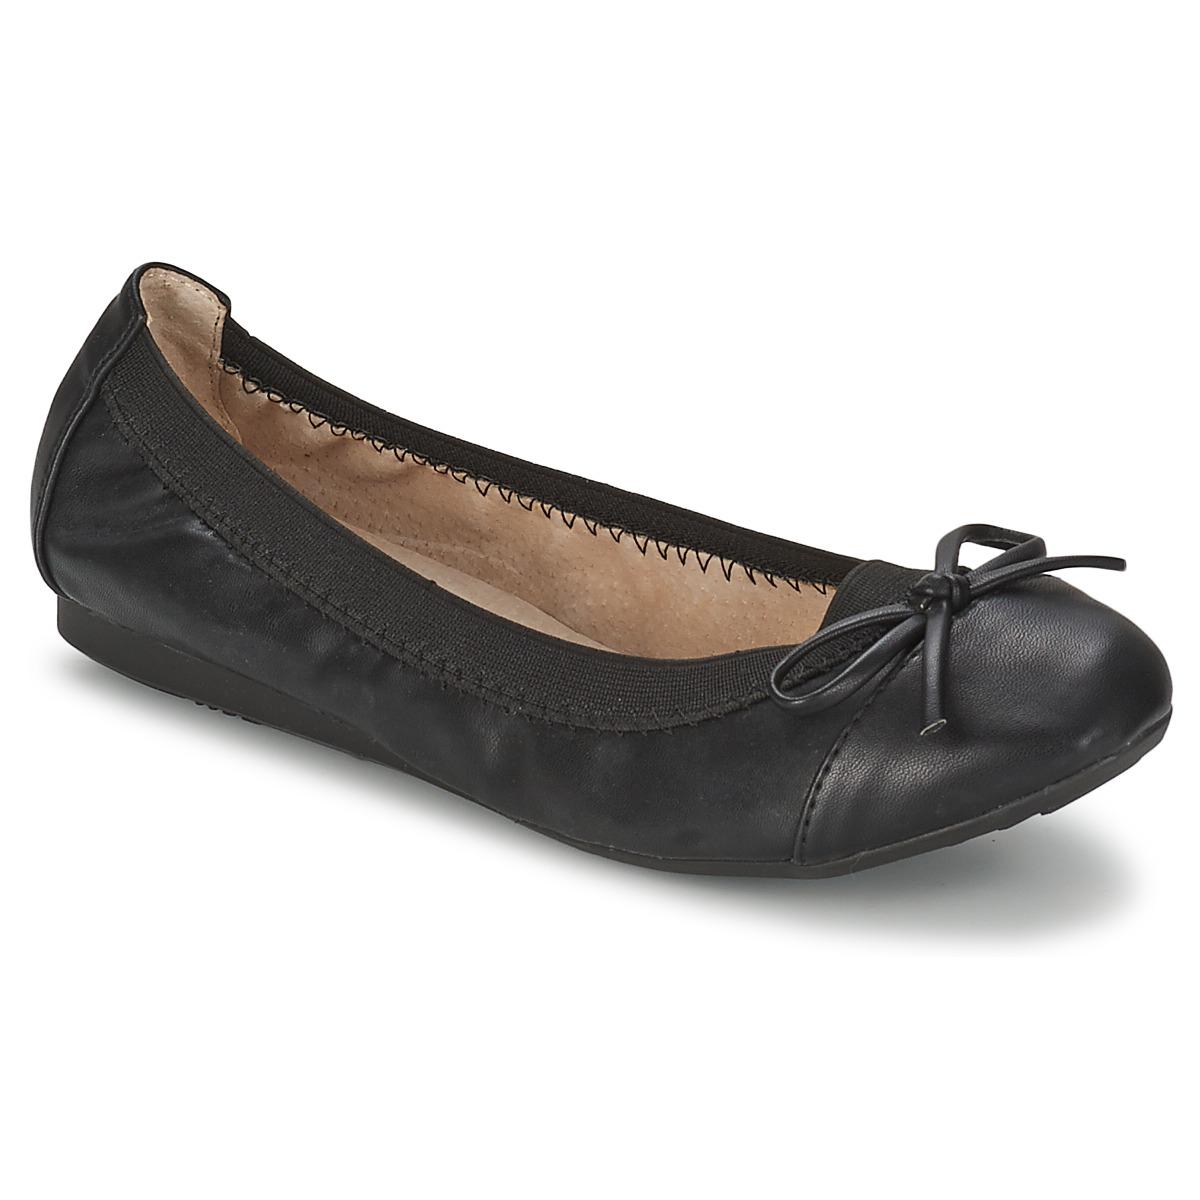 Moony Mood BOLALA Schwarz - Kostenloser Versand bei Spartoode ! - Schuhe Ballerinas Damen 22,39 €